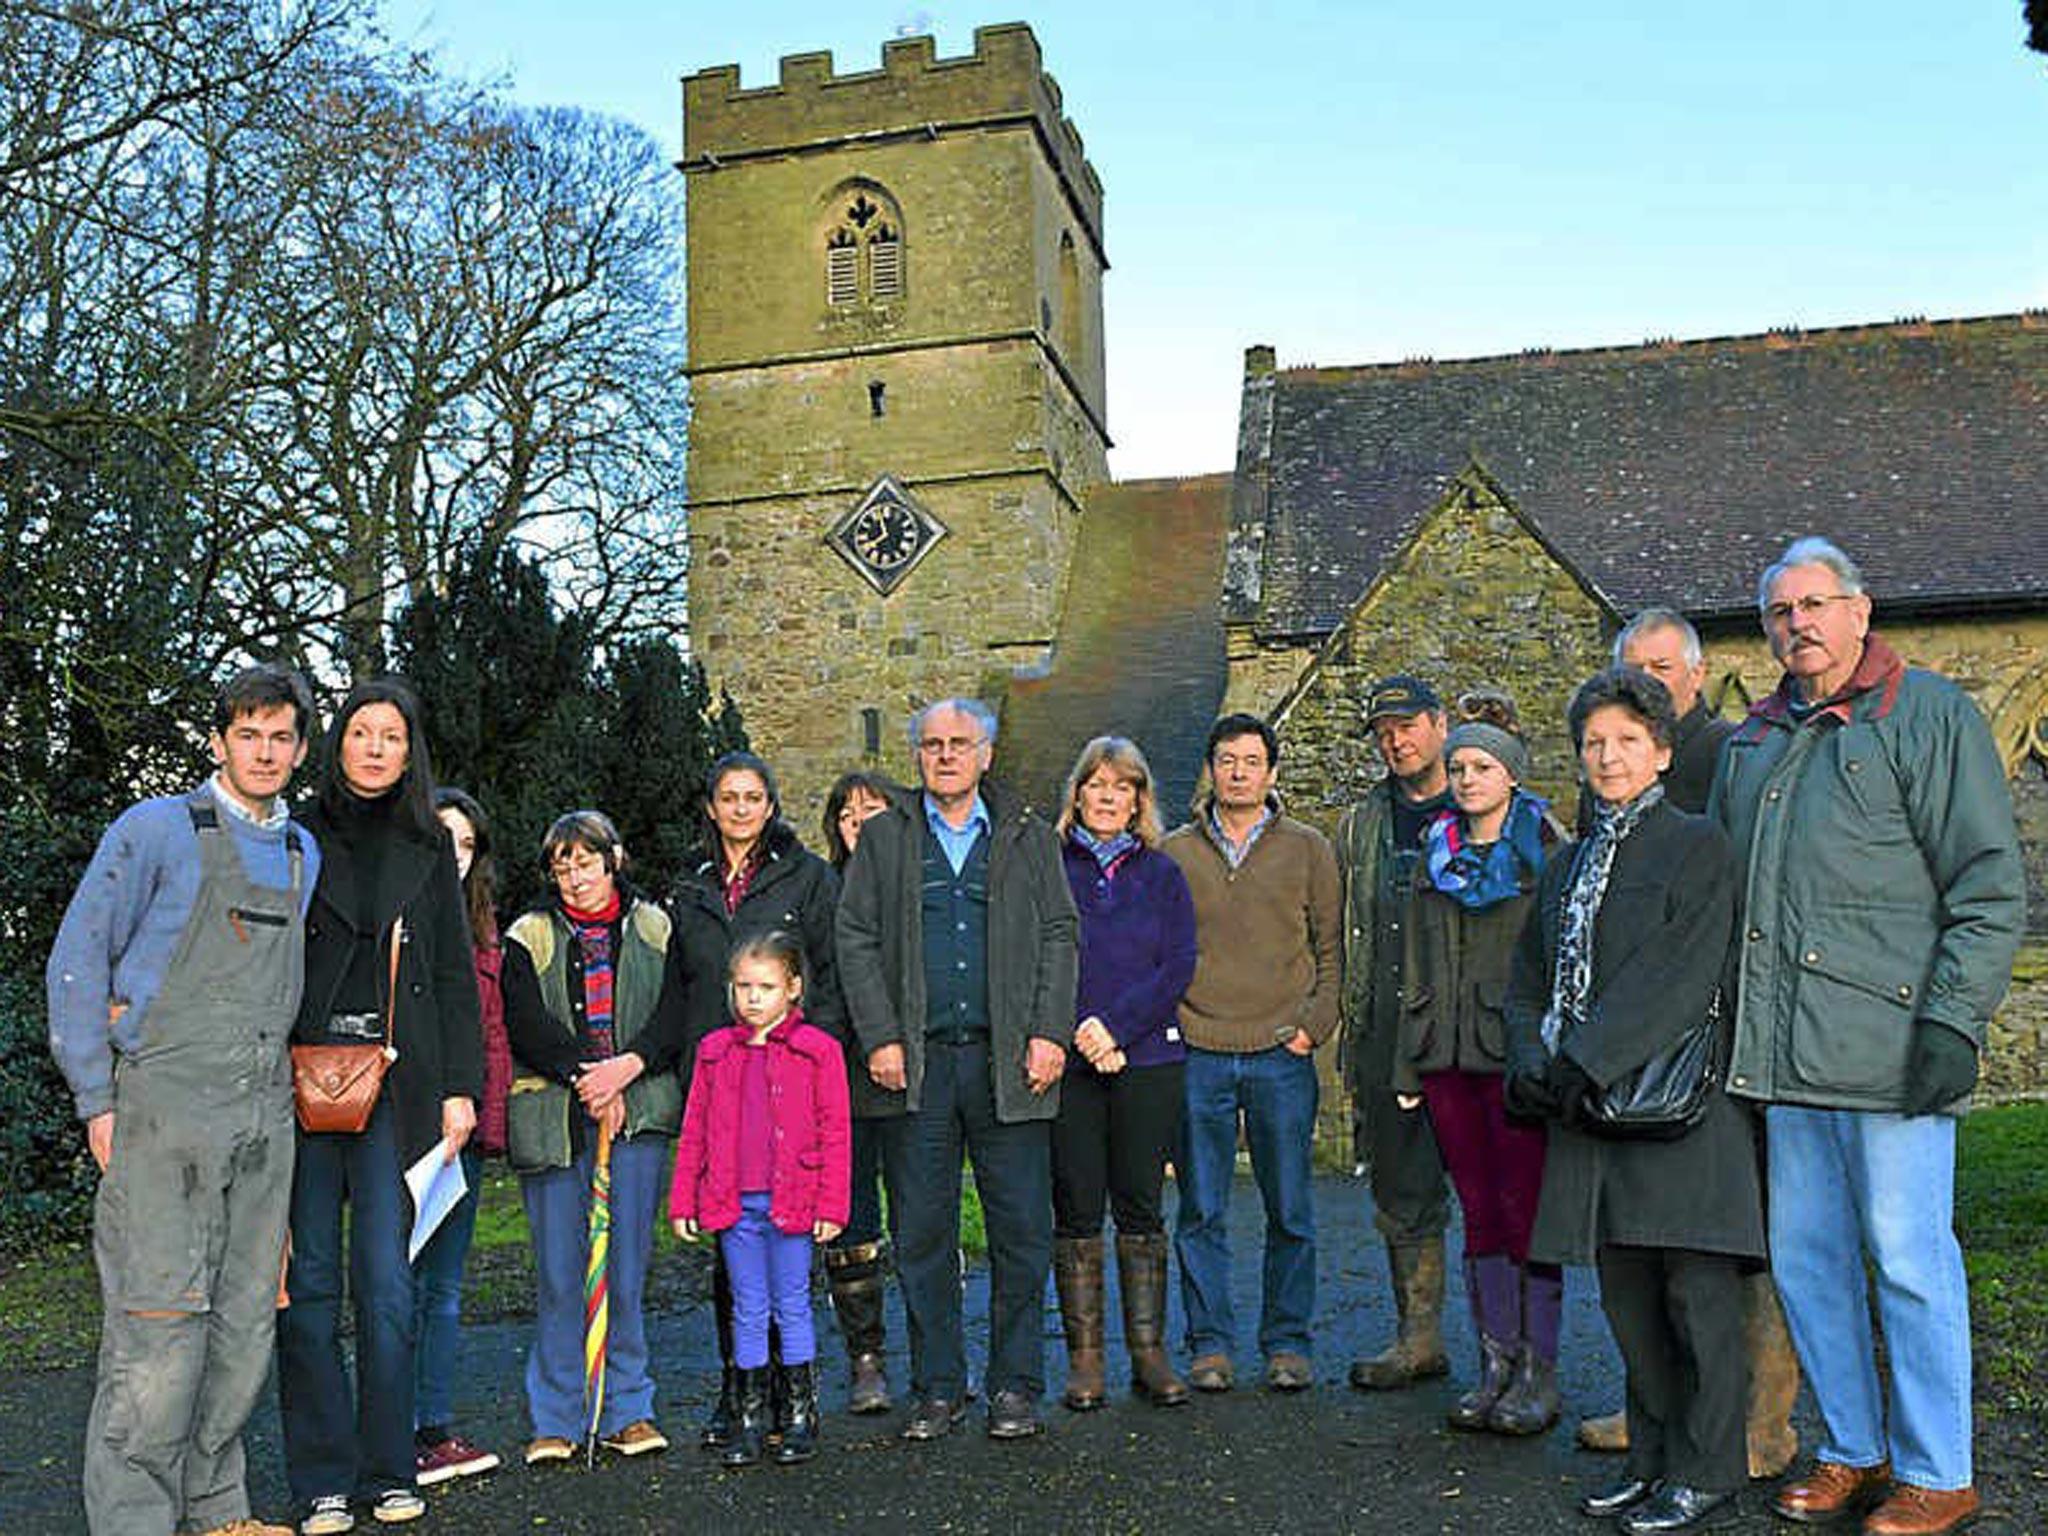 Not very Christian: Rural communities in uproar as 250